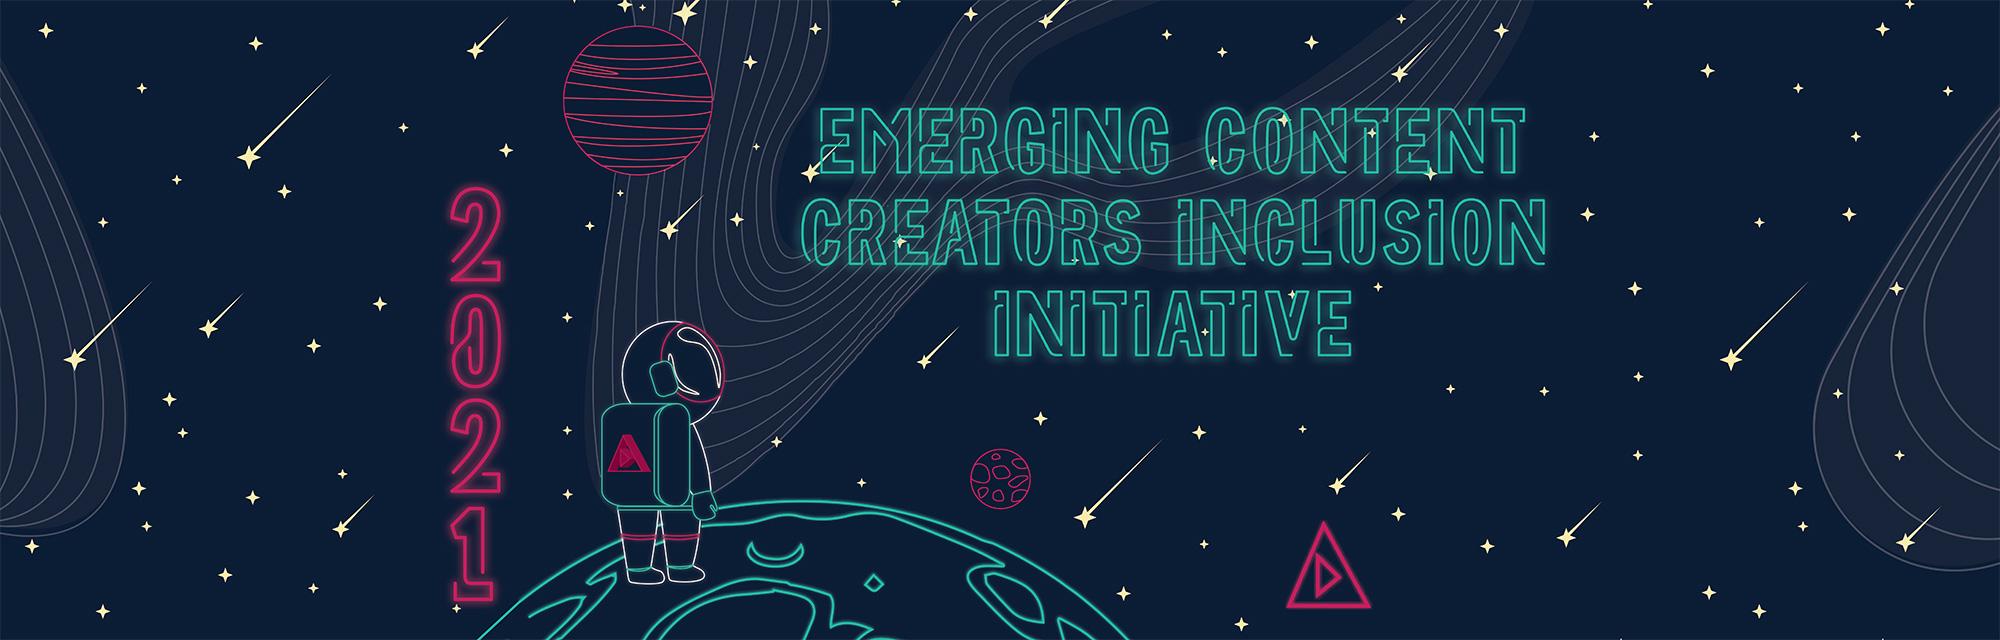 Emerging Content Creators Inclusion Initiative (ECCII)